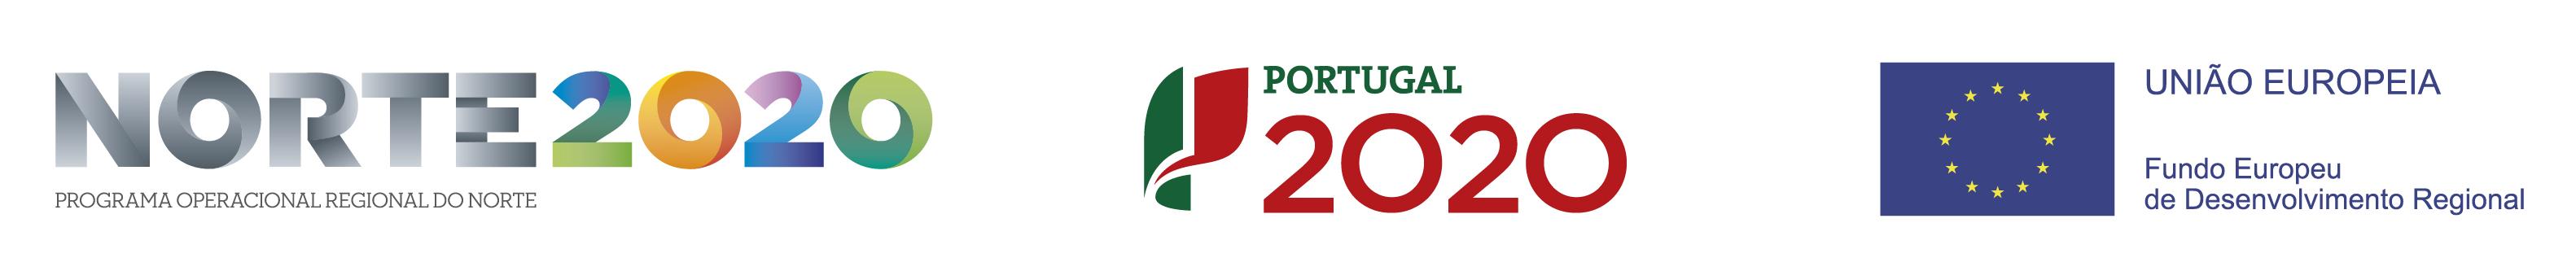 logos financiamento europeu FEDER NORTE 2020